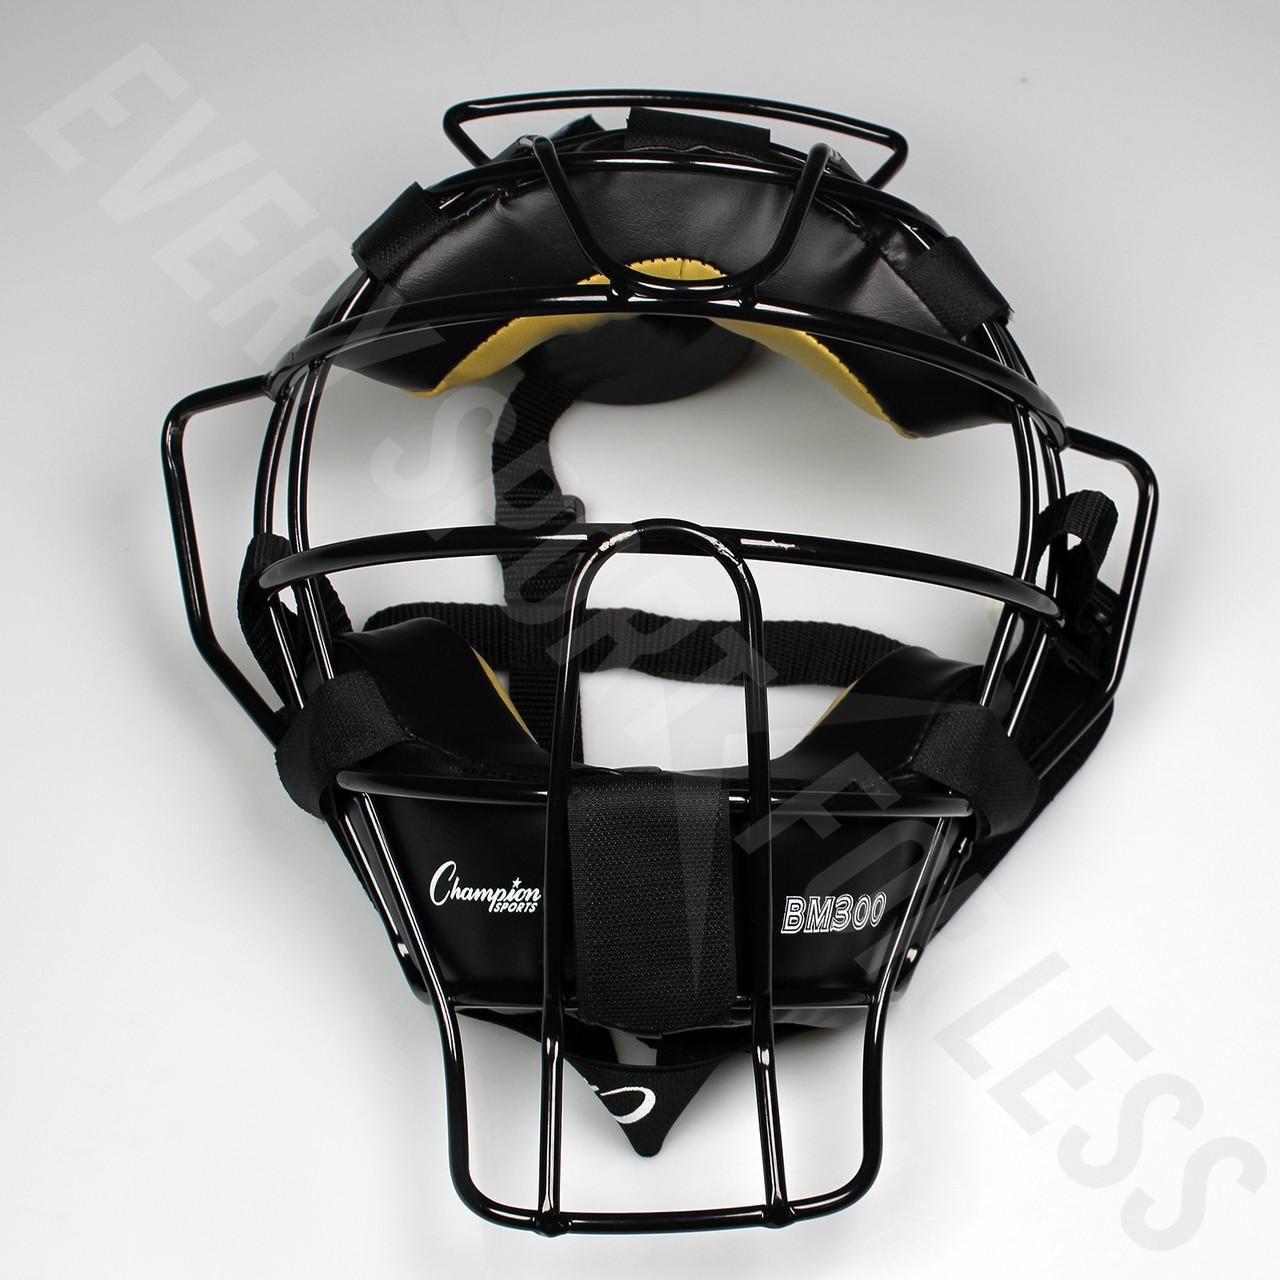 244437edf80b ... Champion Ultra Light Baseball Umpire Mask BM300 - Black ...